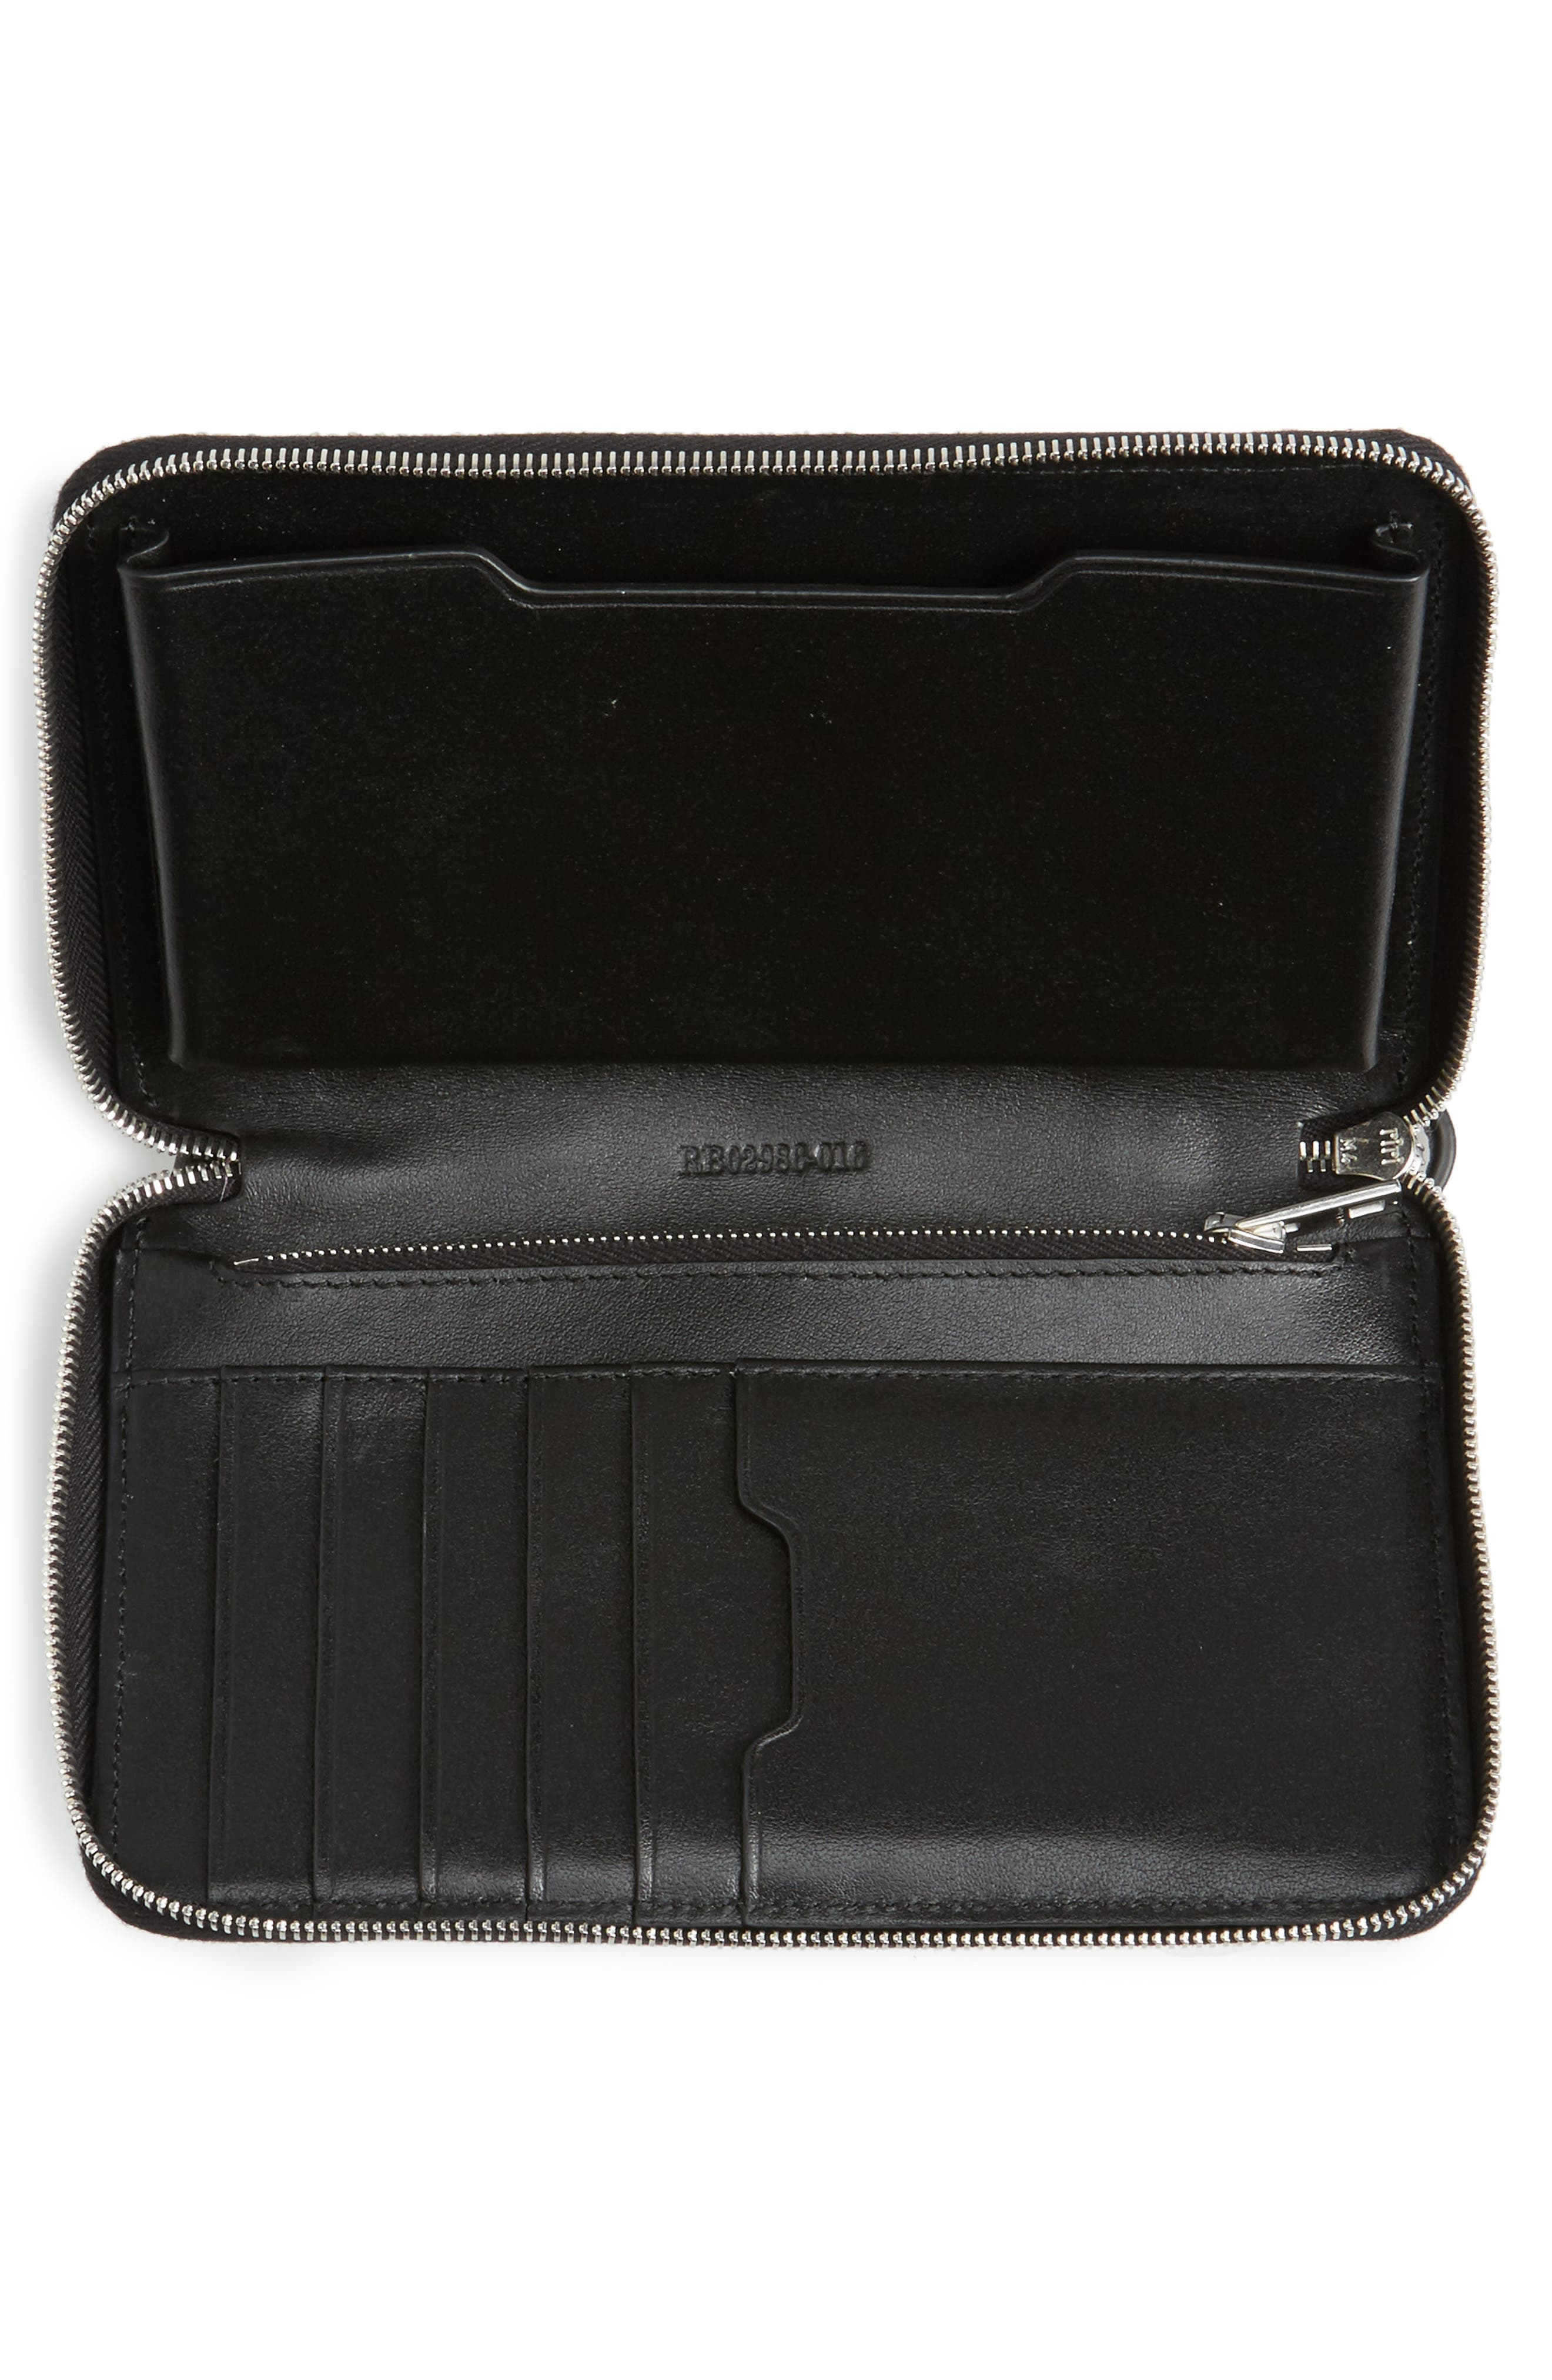 Studded Leather Smartphone Wallet,                             Alternate thumbnail 3, color,                             Black Studs